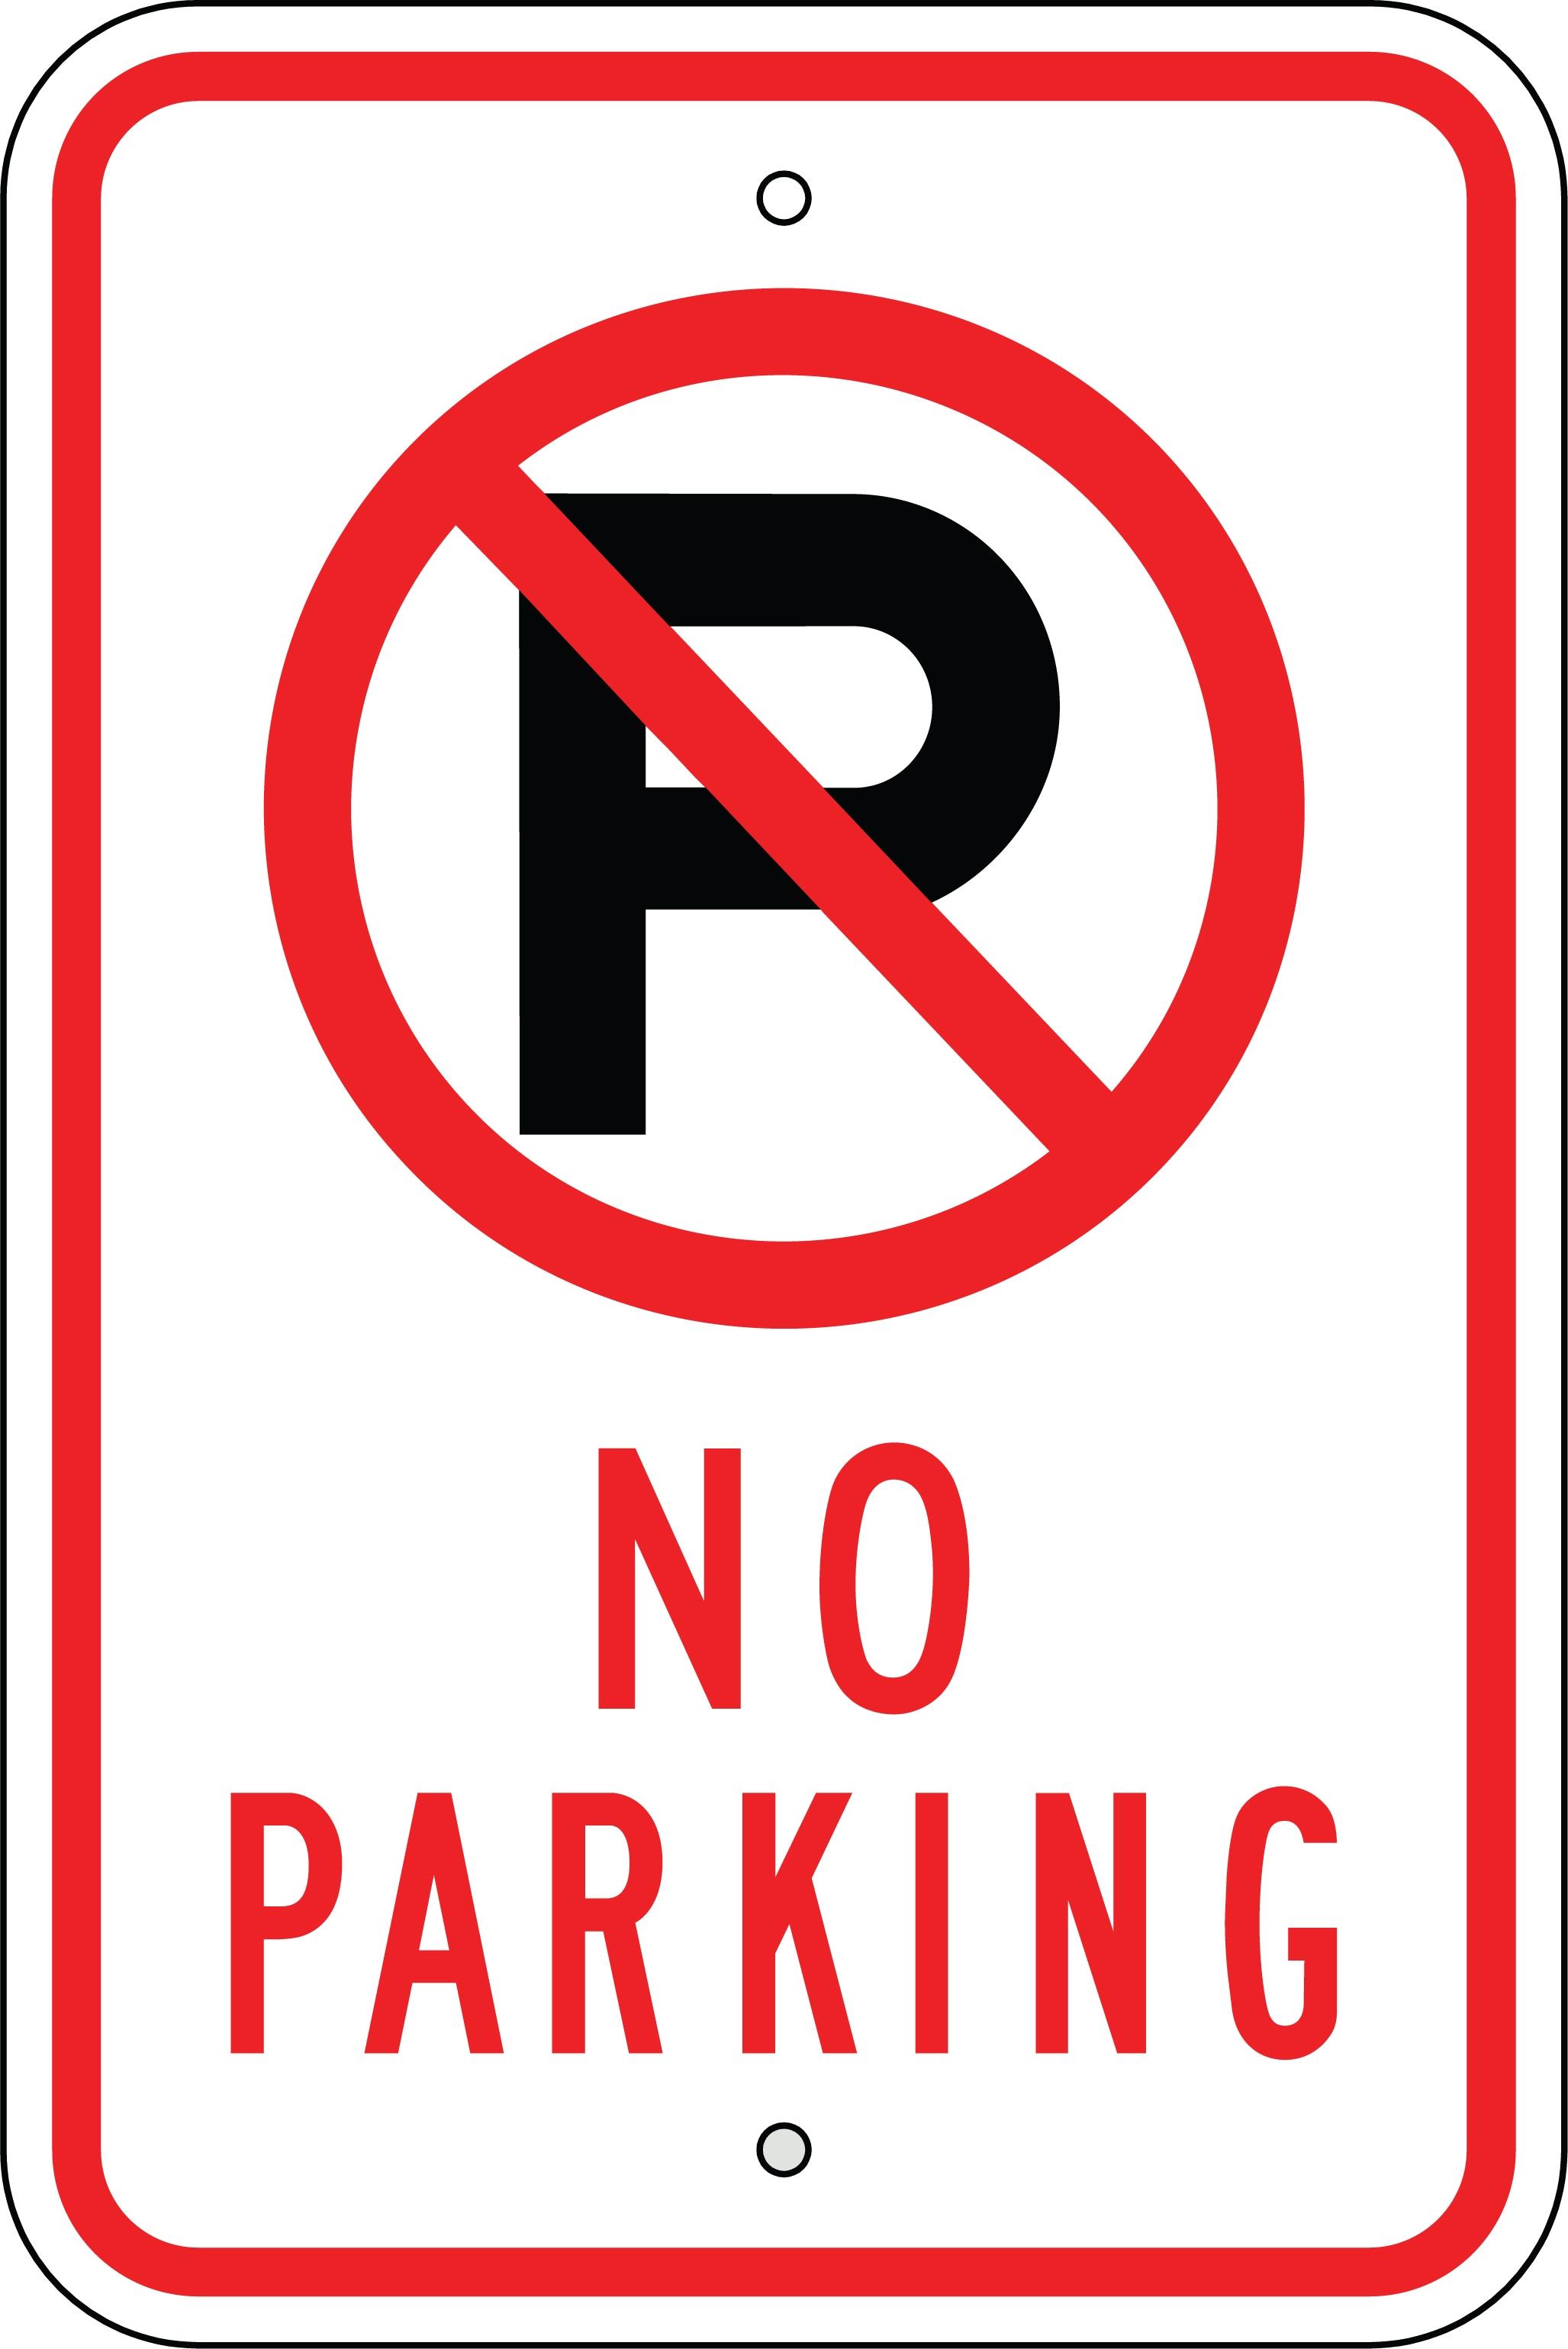 f83e0be4159ed772fcfc_no_parking.jpeg